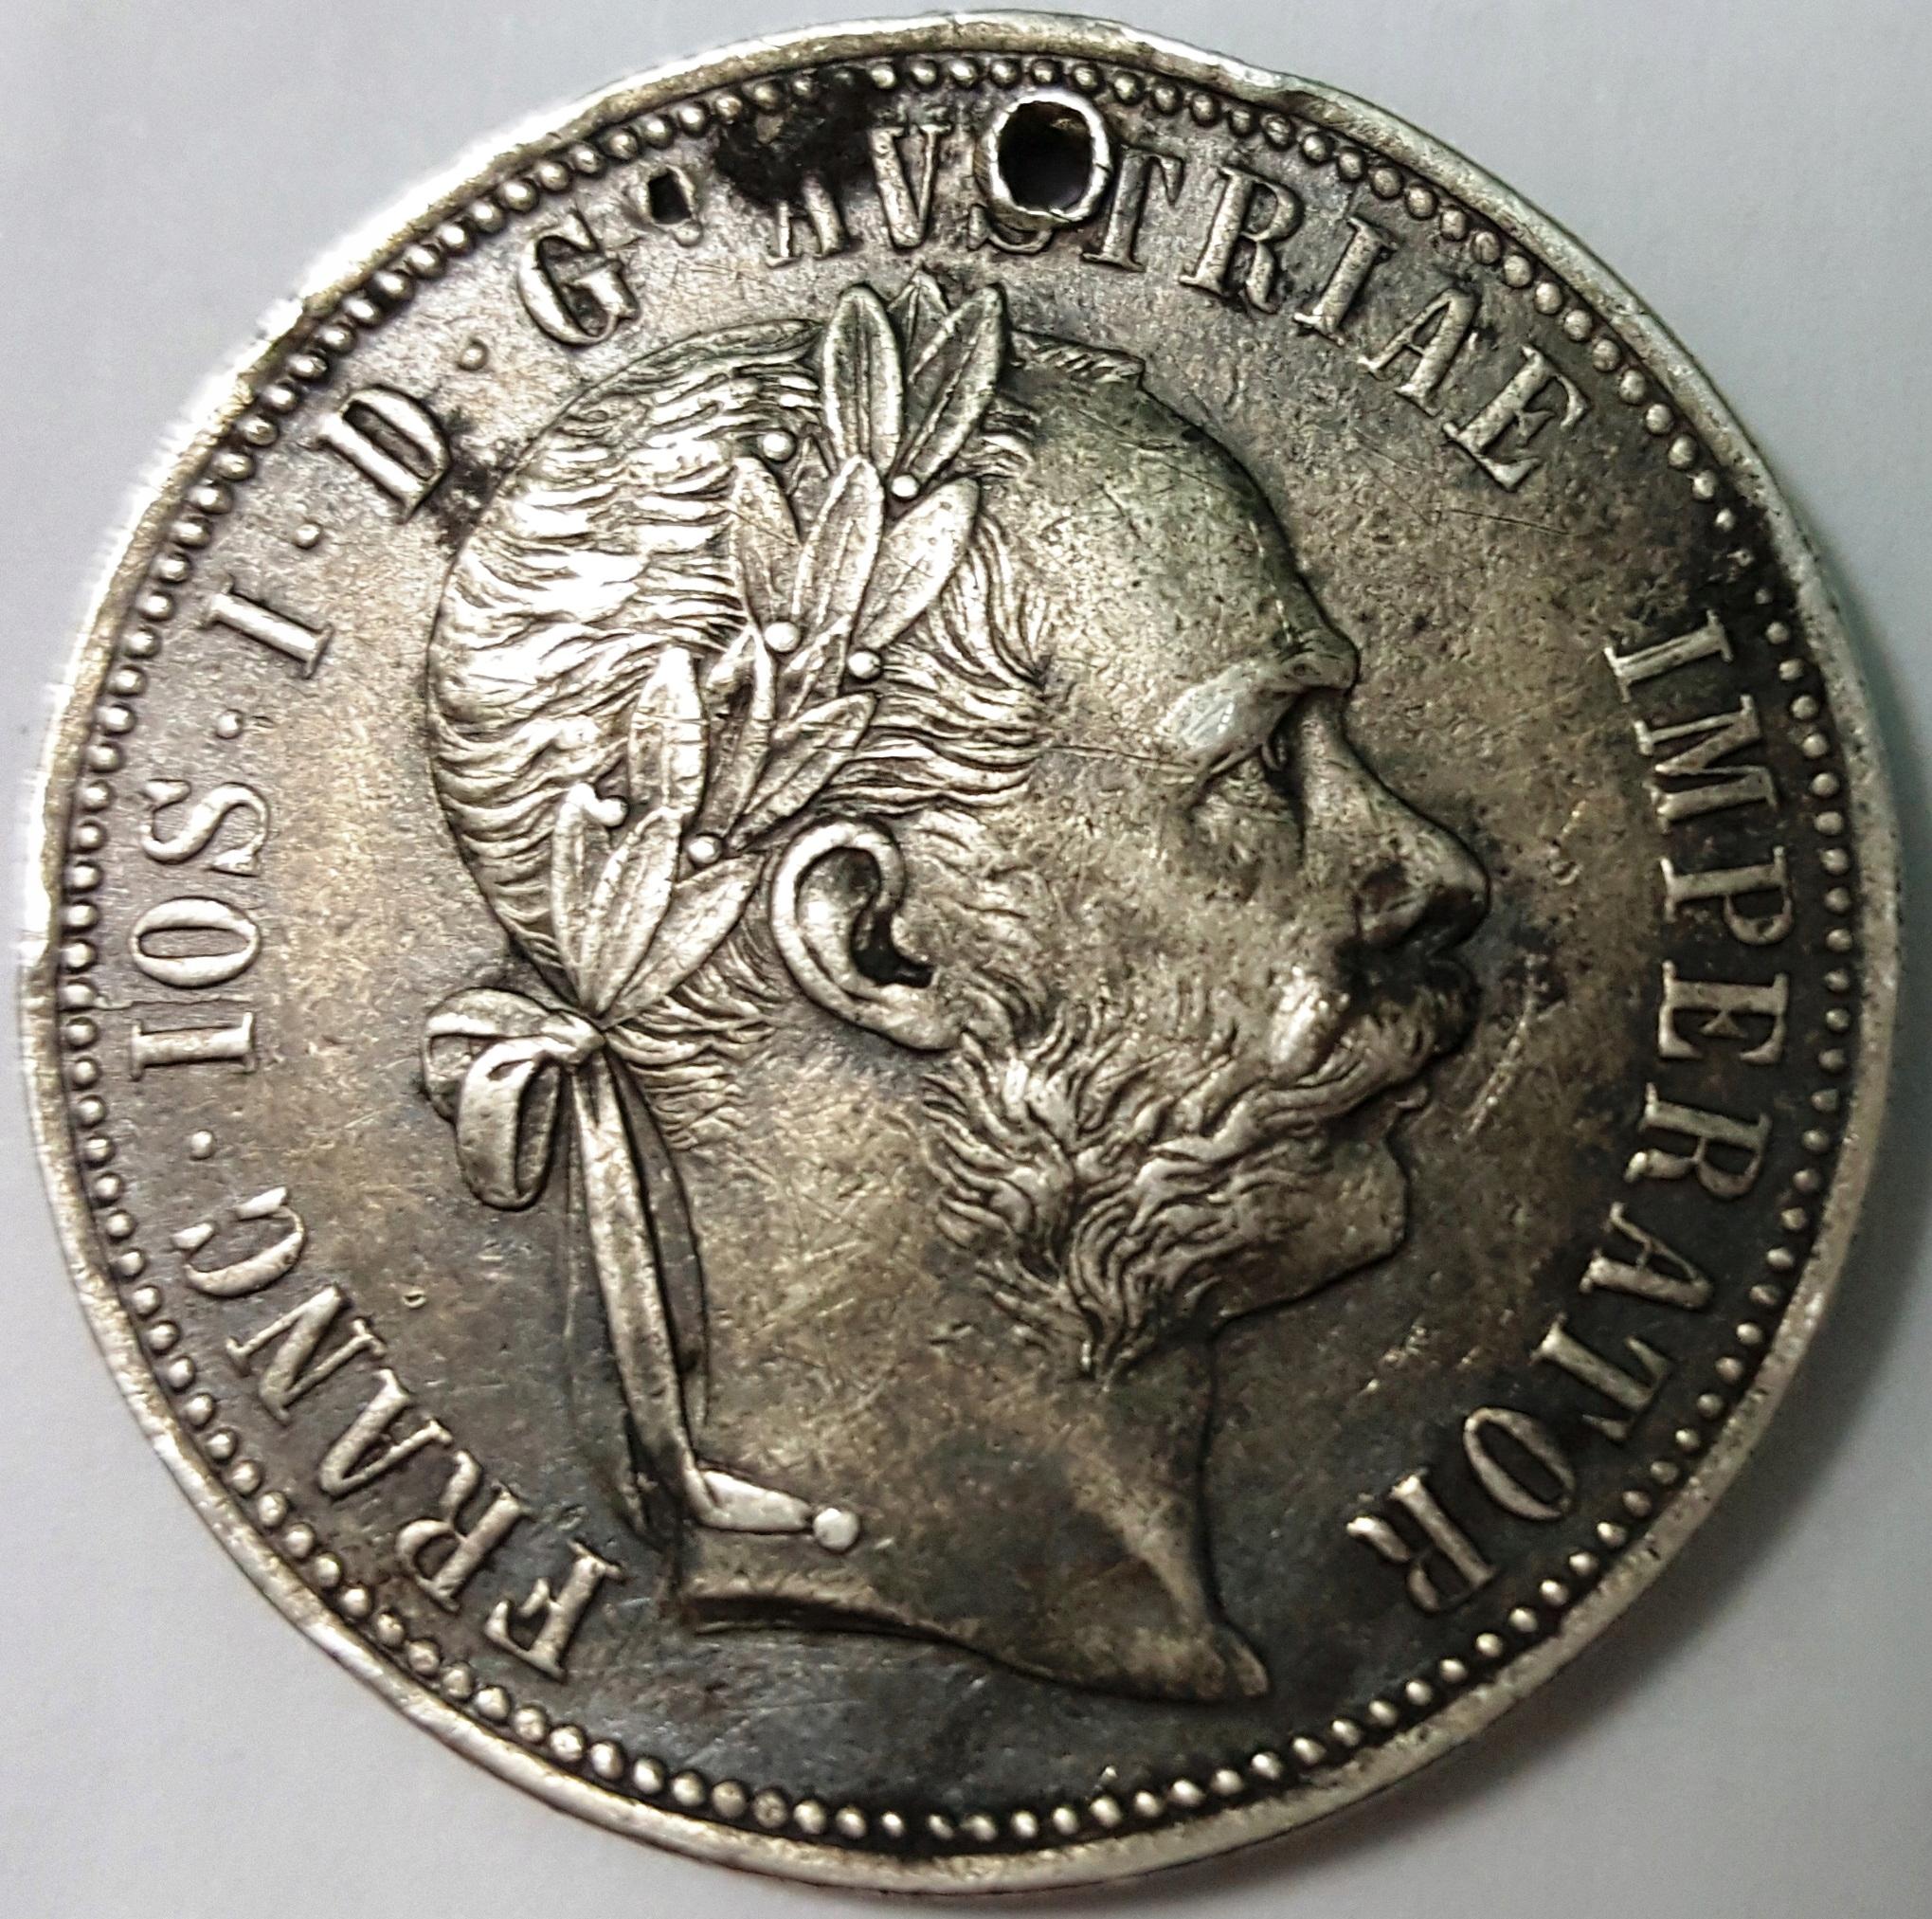 ANK AUSTRO-WĘGRY FRANC IOS 1 FLOREN 1888 !!!!!!!!!